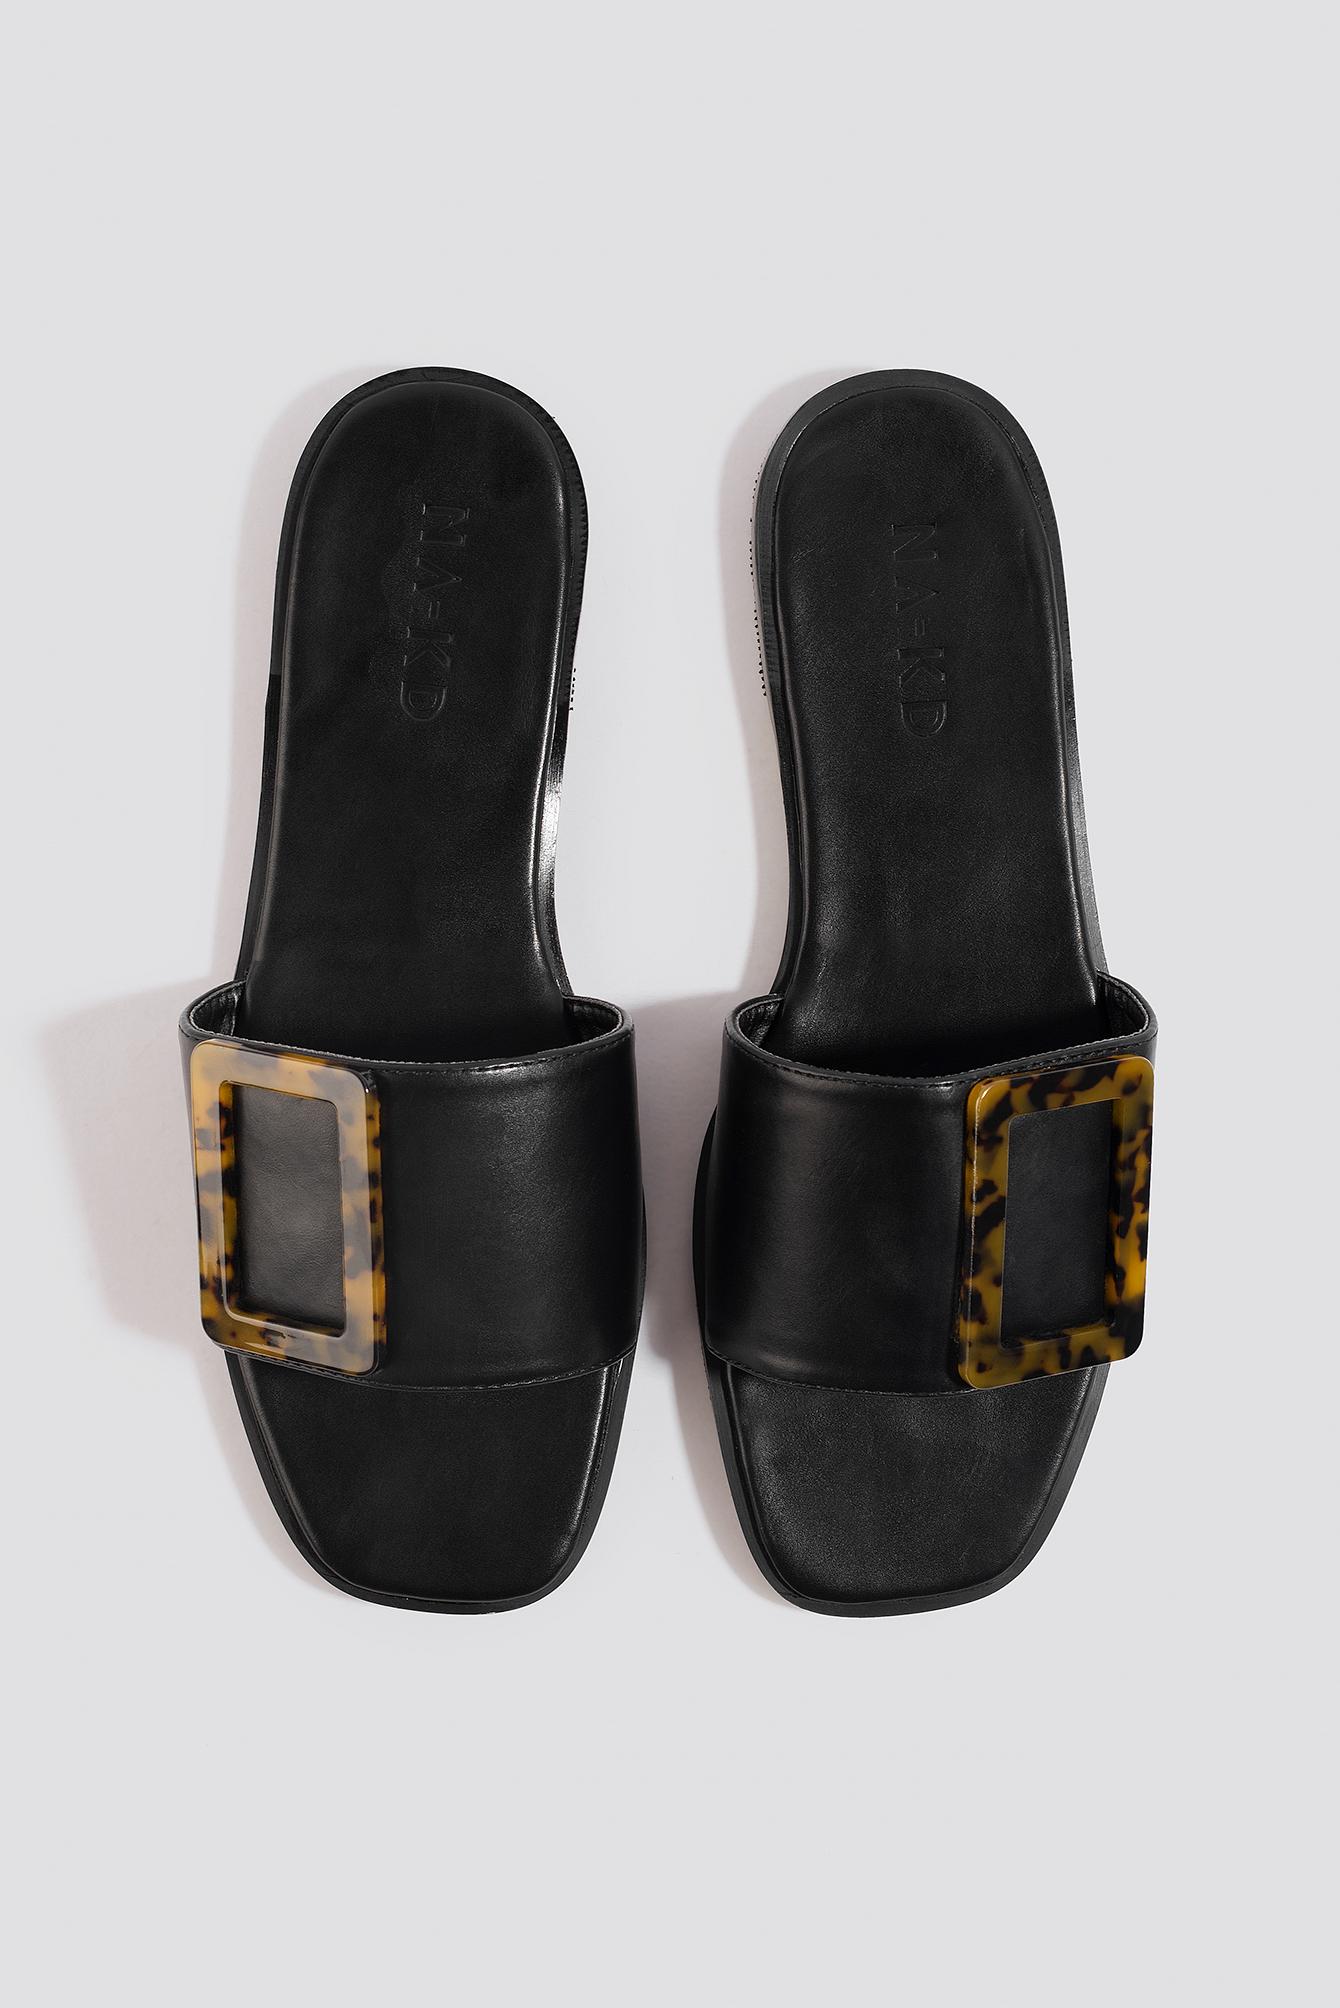 na-kd shoes -  Big Buckle Flats - Black